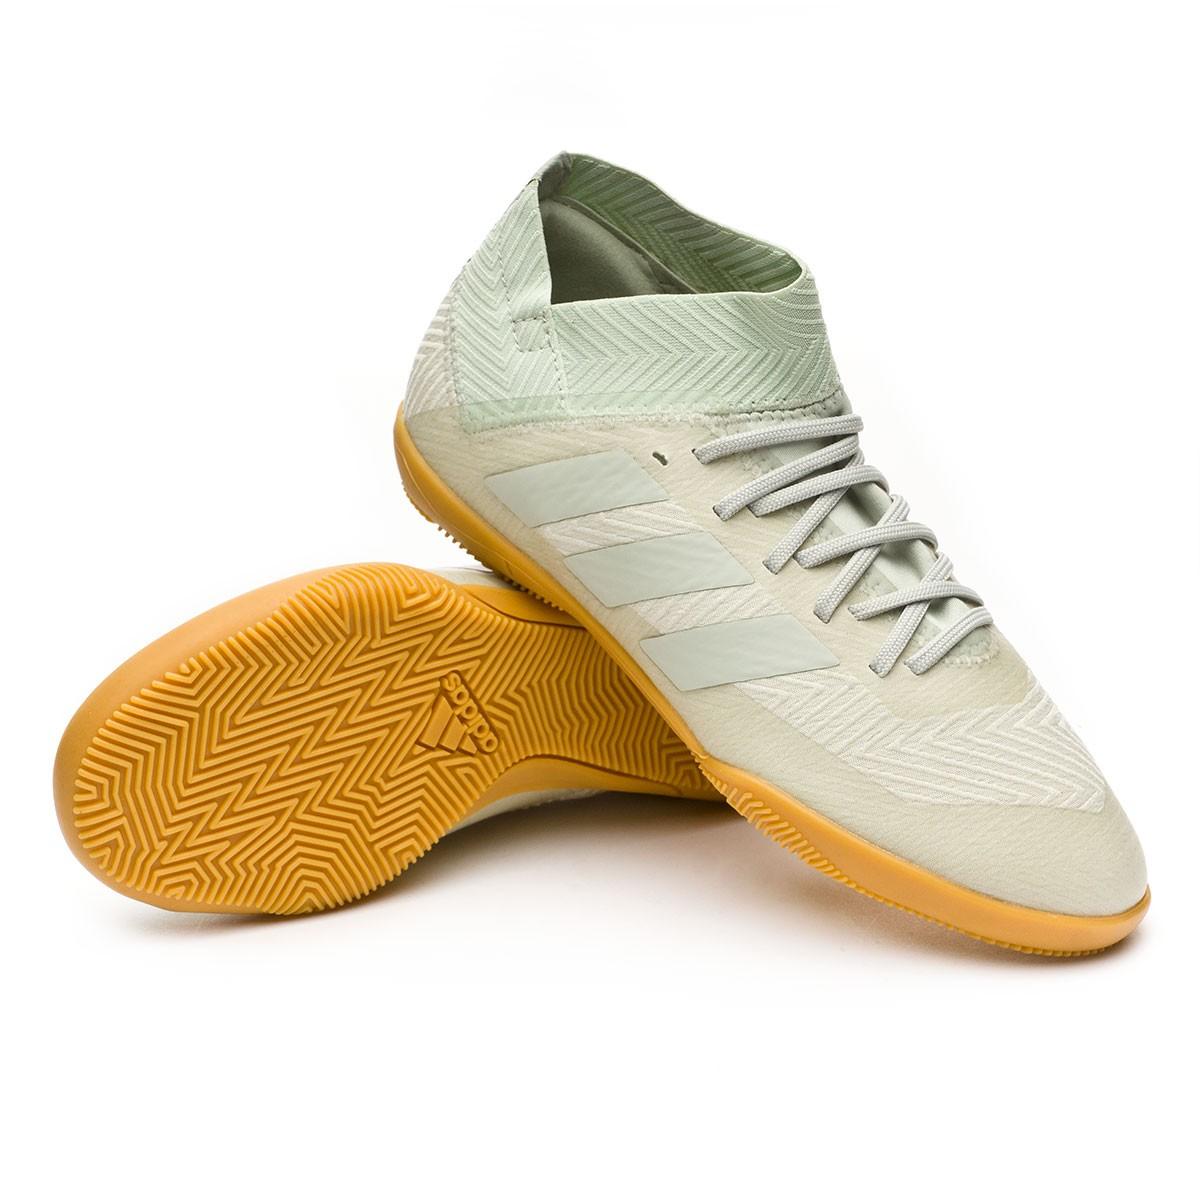 Chaussure de futsal adidas Nemeziz Tango 18.3 IN Football